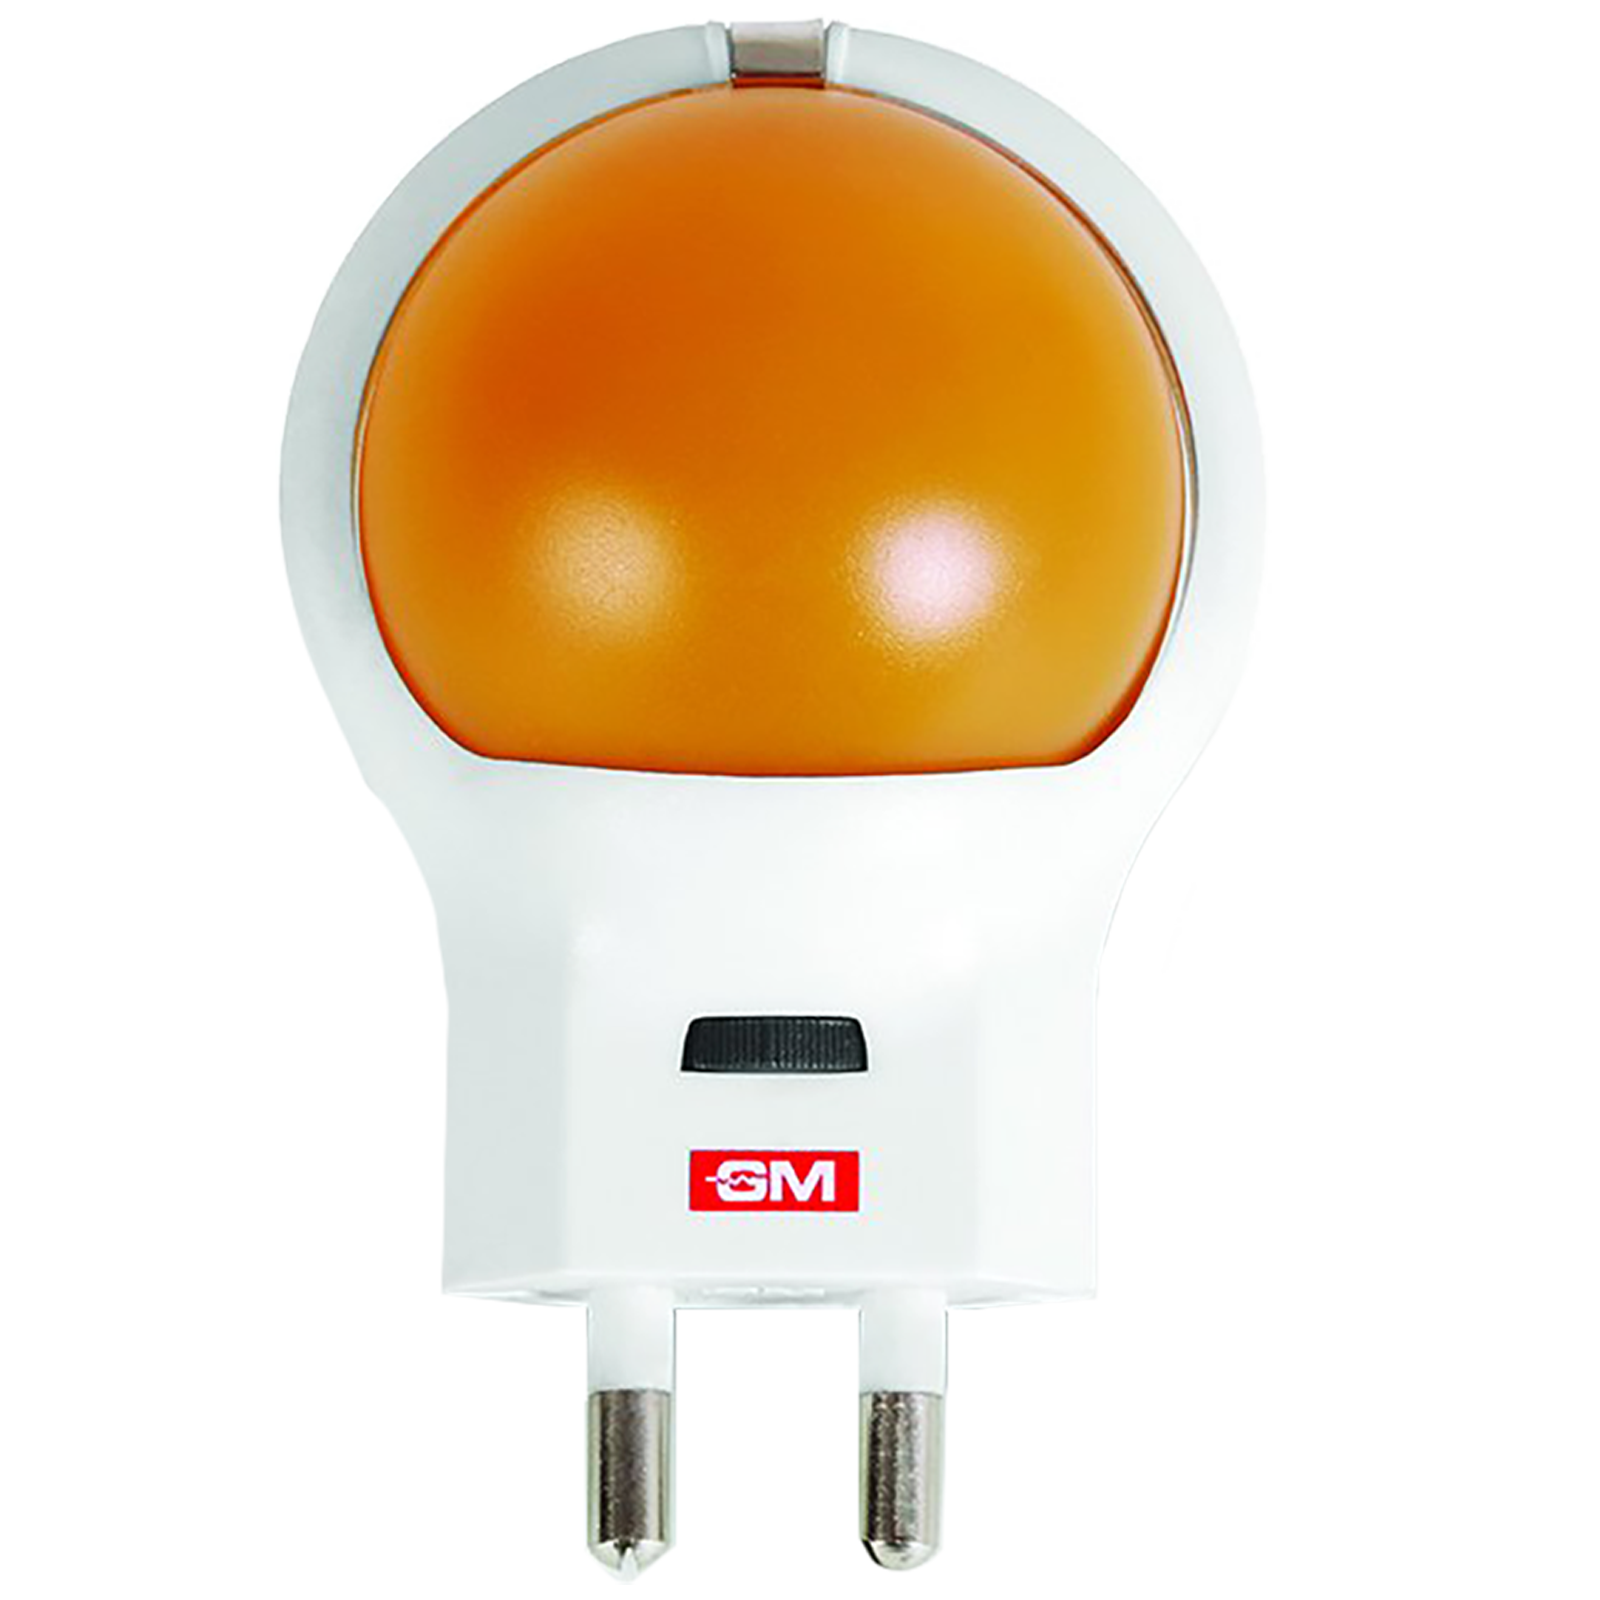 GM Planet-G 0.5 Watts LED Night Lamp (Light Adjustable Scroll Button, 3089, Orange/White)_1